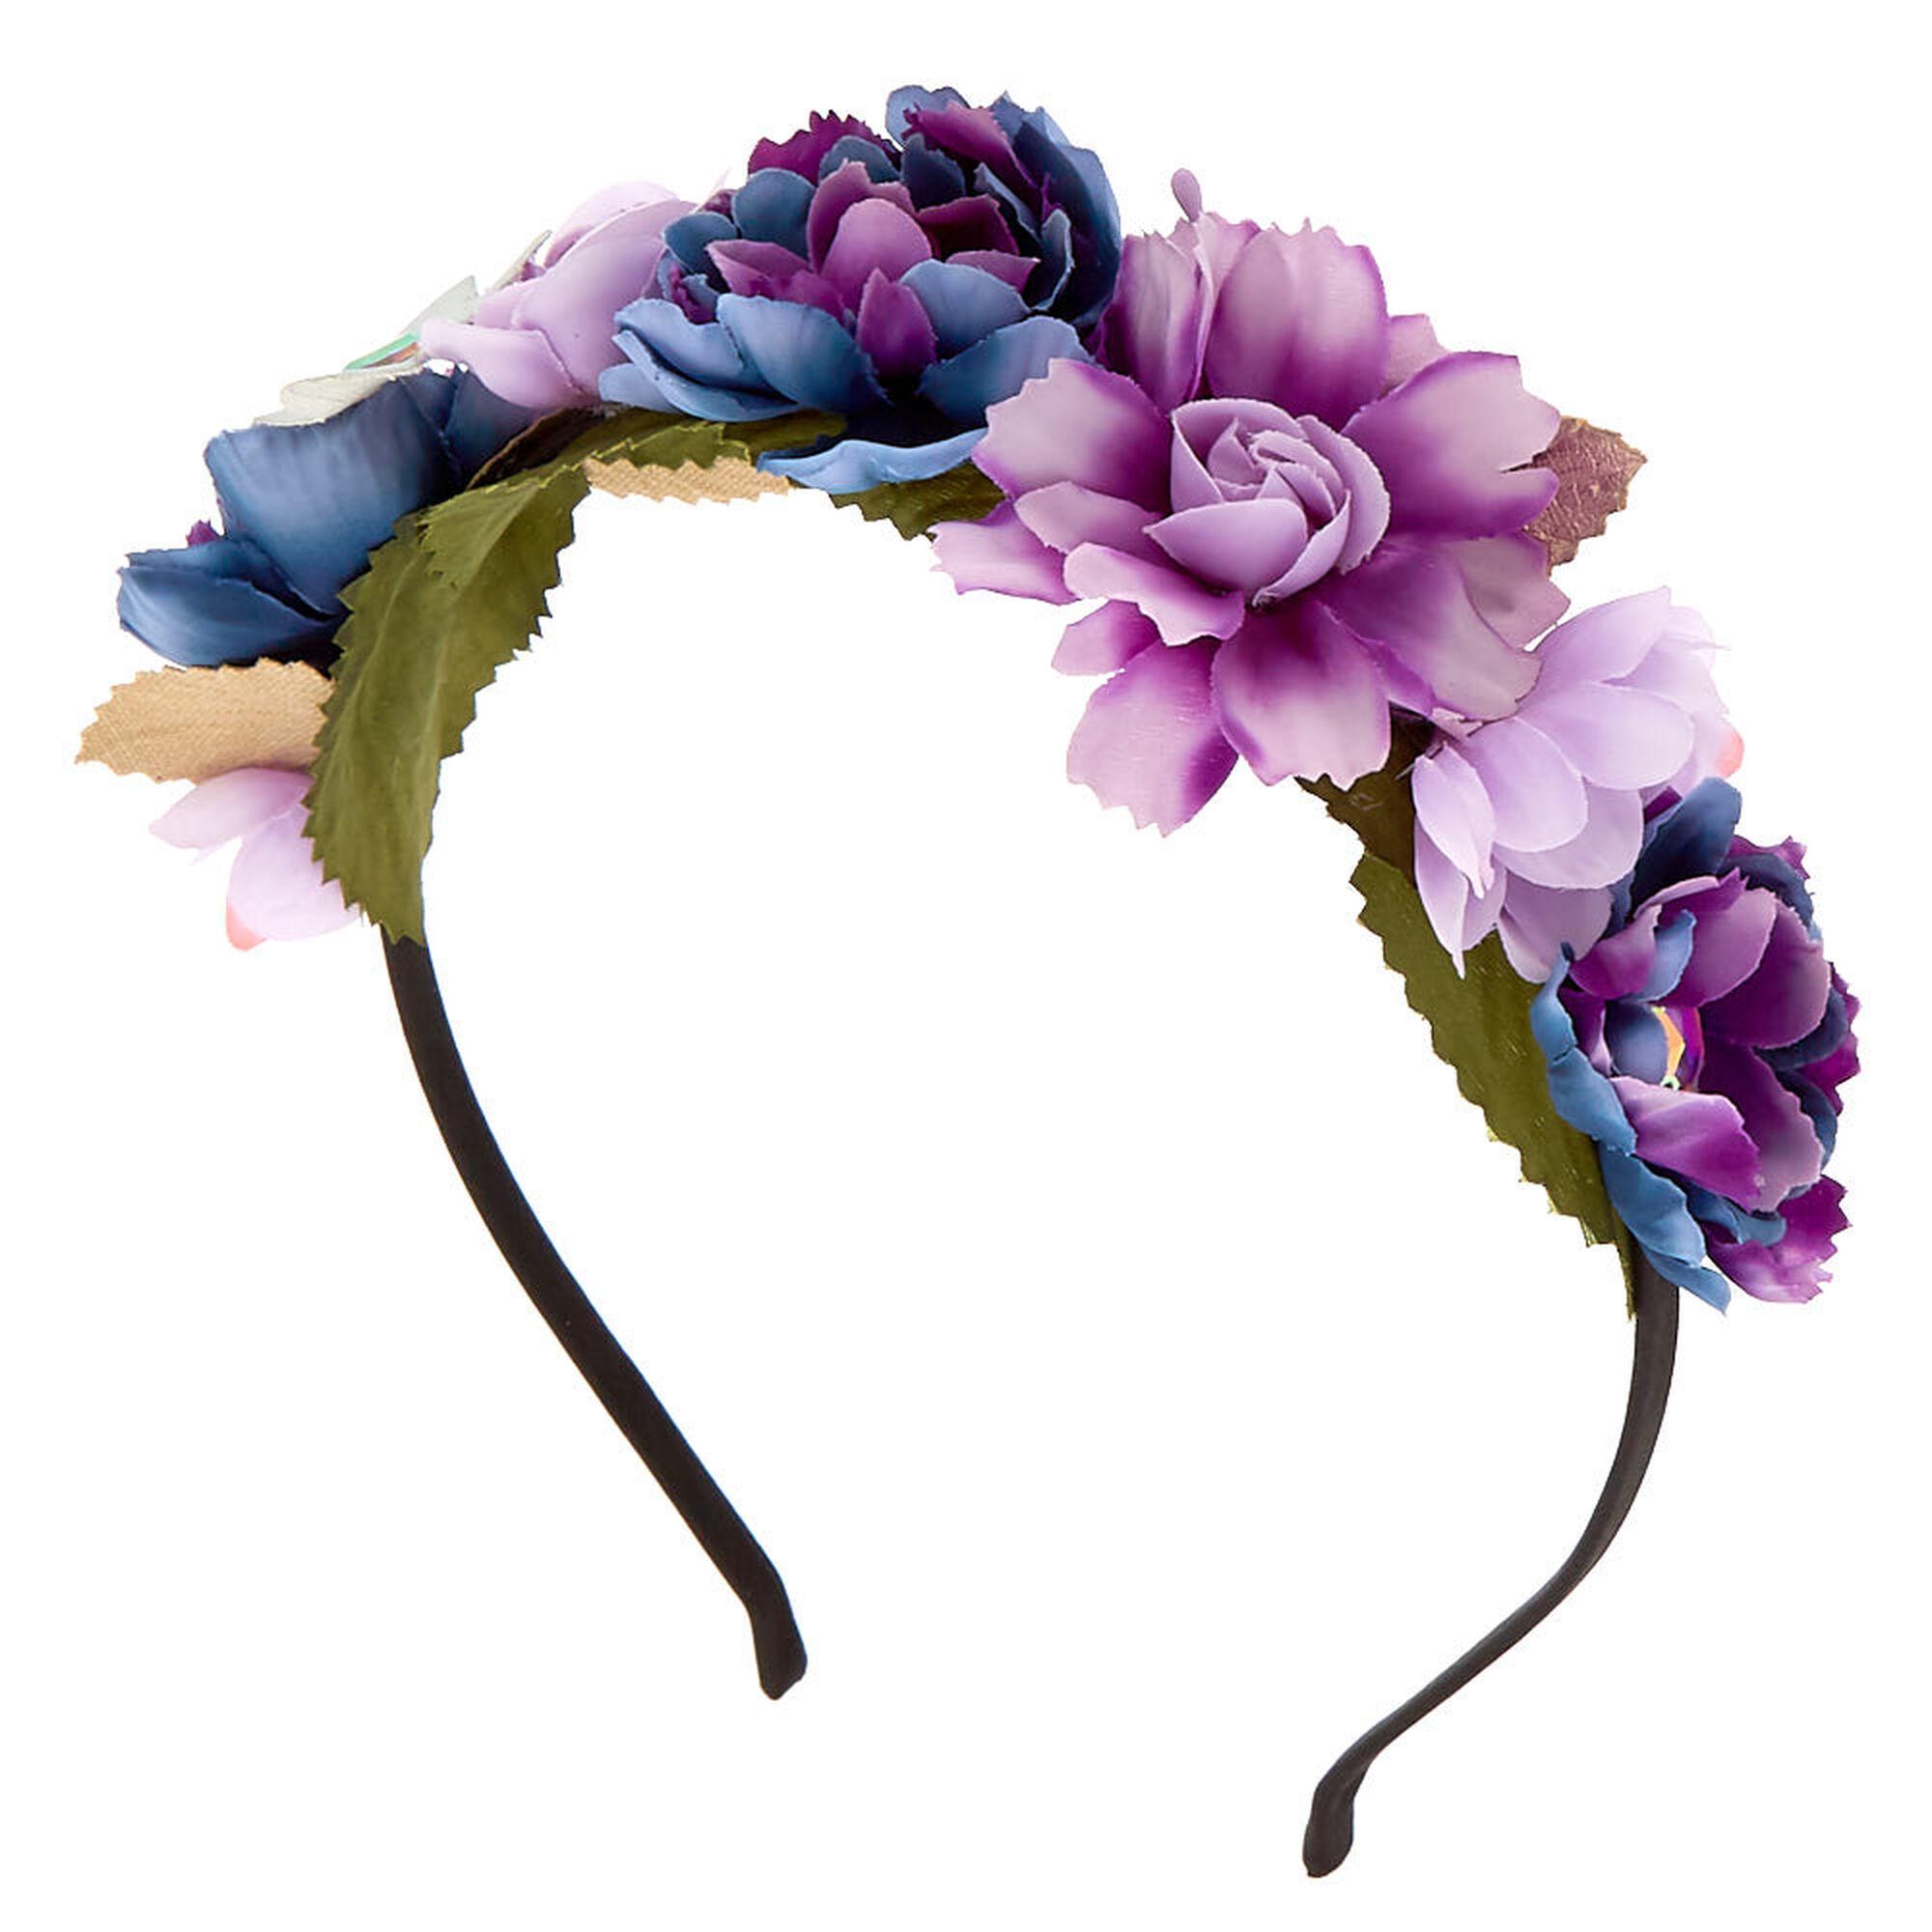 Metallic galaxy flower crown headband purple claires us metallic galaxy flower crown headband purple izmirmasajfo